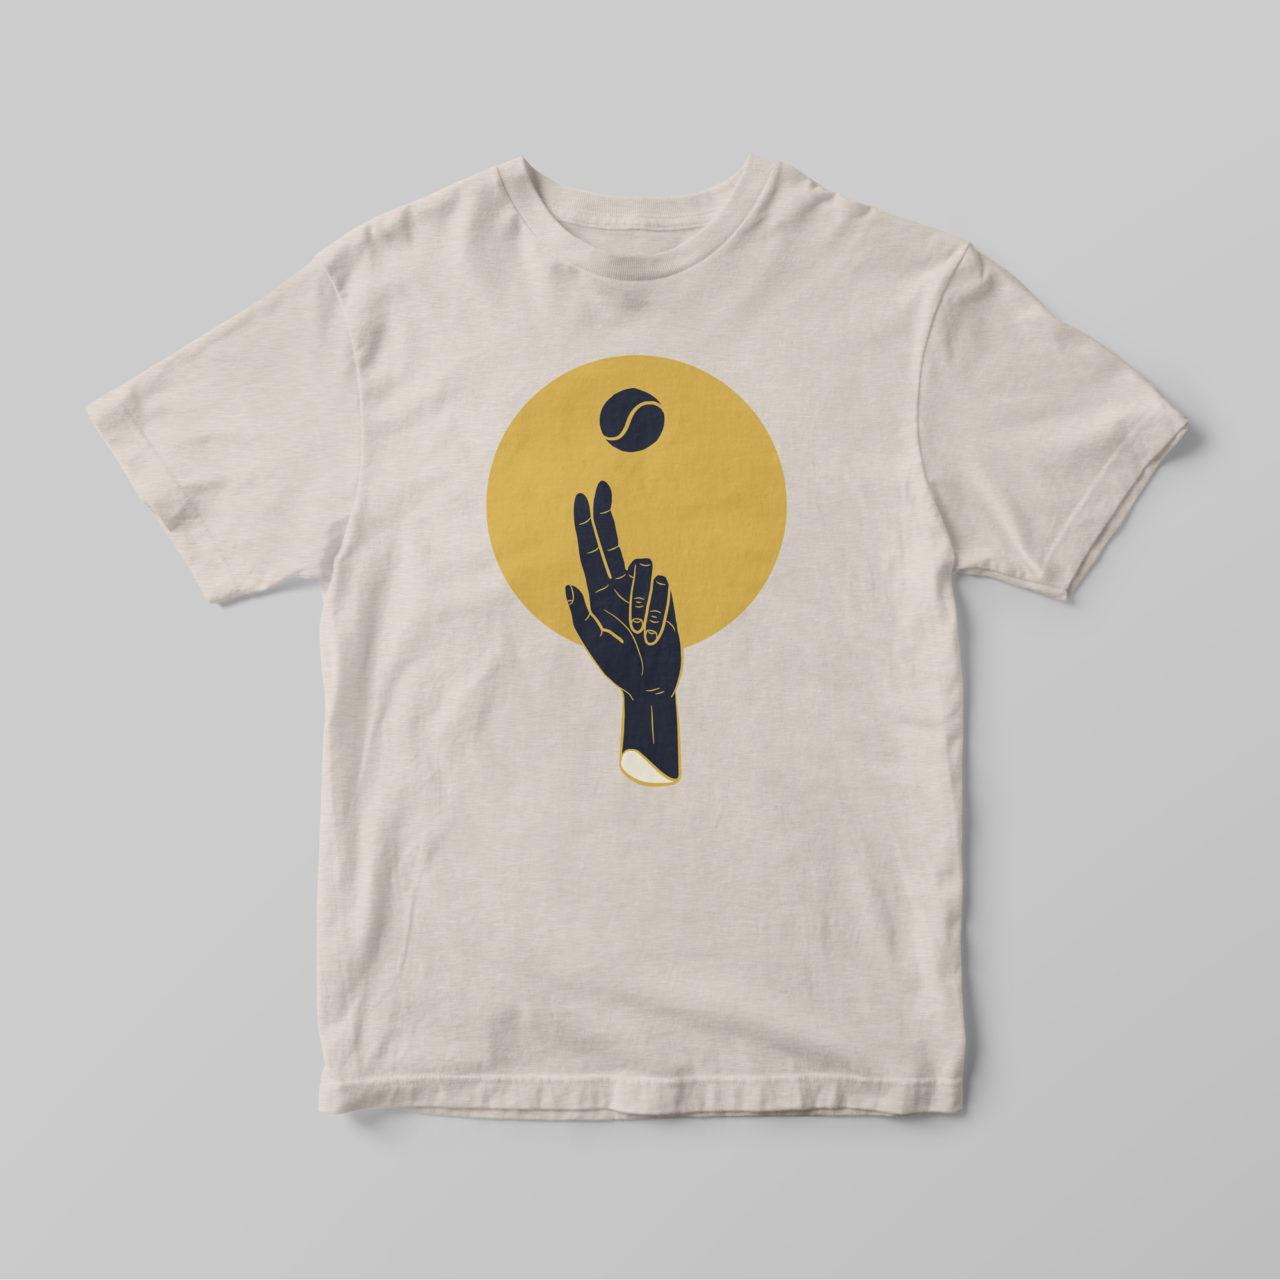 Tshirt-Mockup_Ren